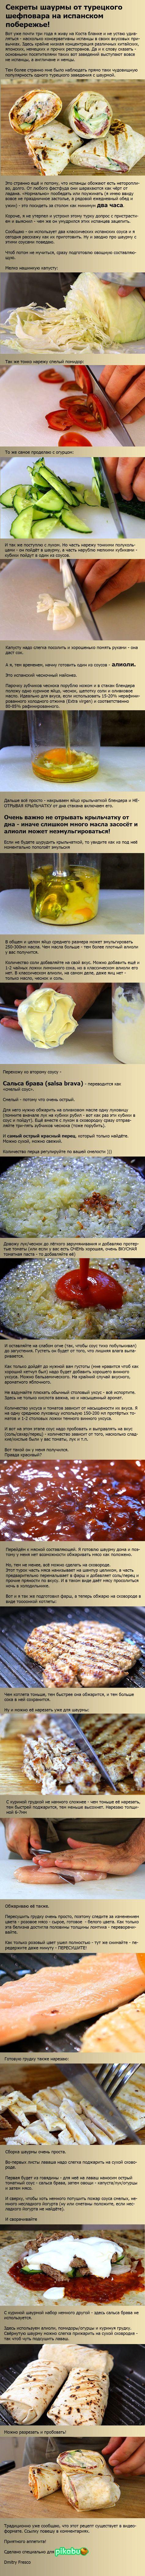 Что могут знать испанцы о настоящей шаурме? рецепт, вкусняшки, еда, COOLинарная PROпаганда, длиннопост, шаурма, шаурмы